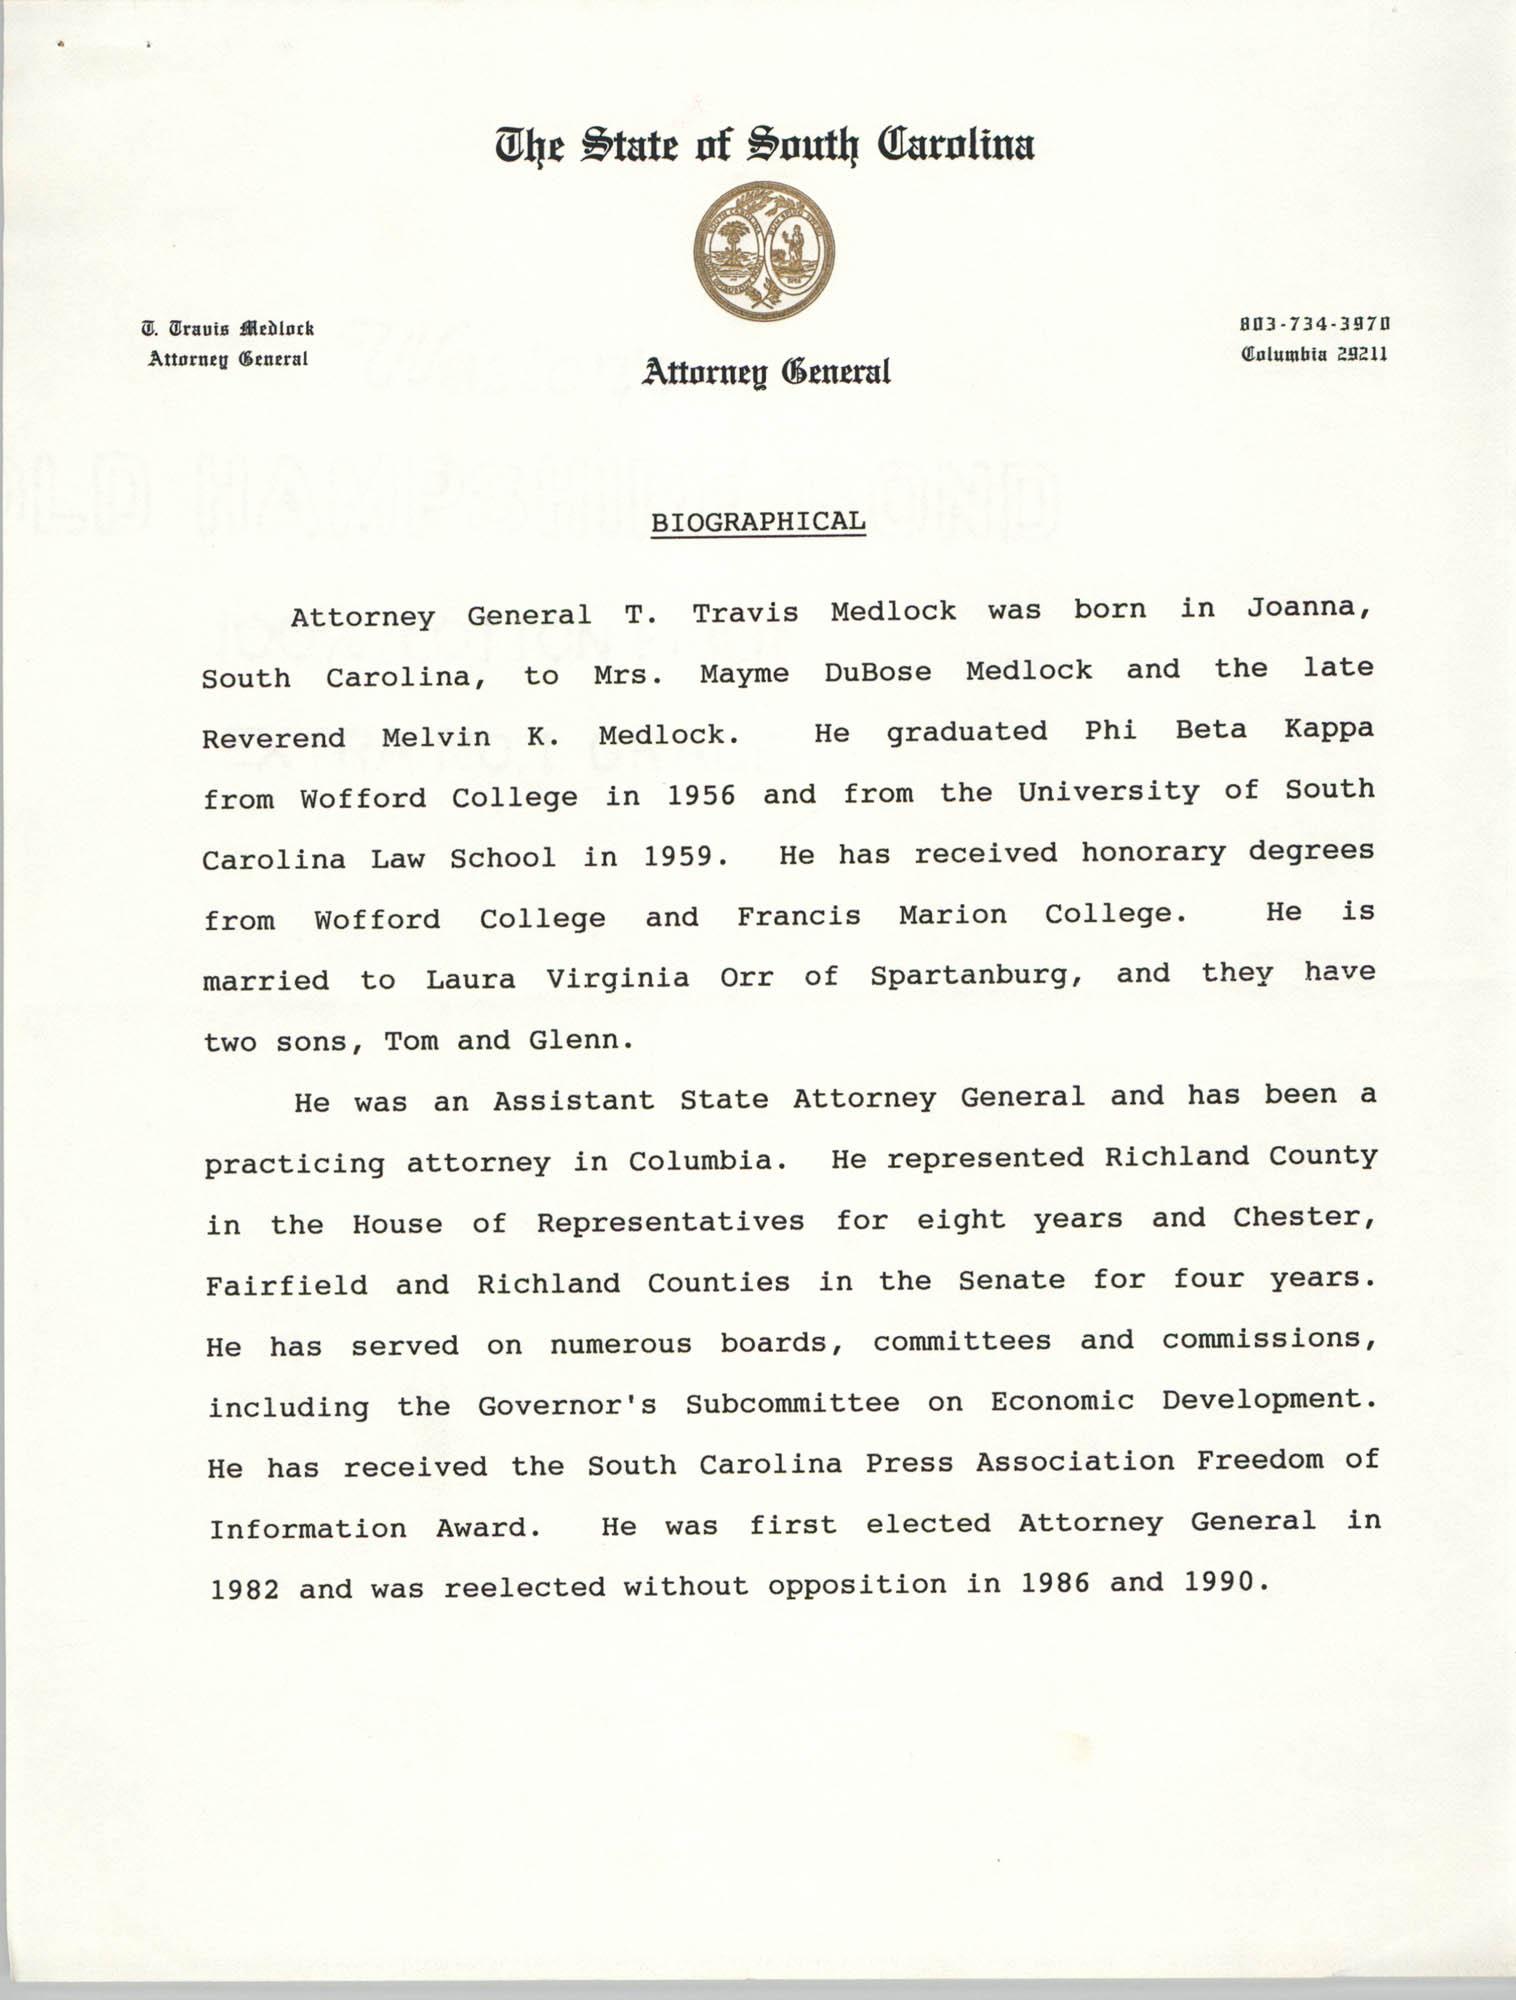 Attorney General T. Travis Medlock Biographical Information